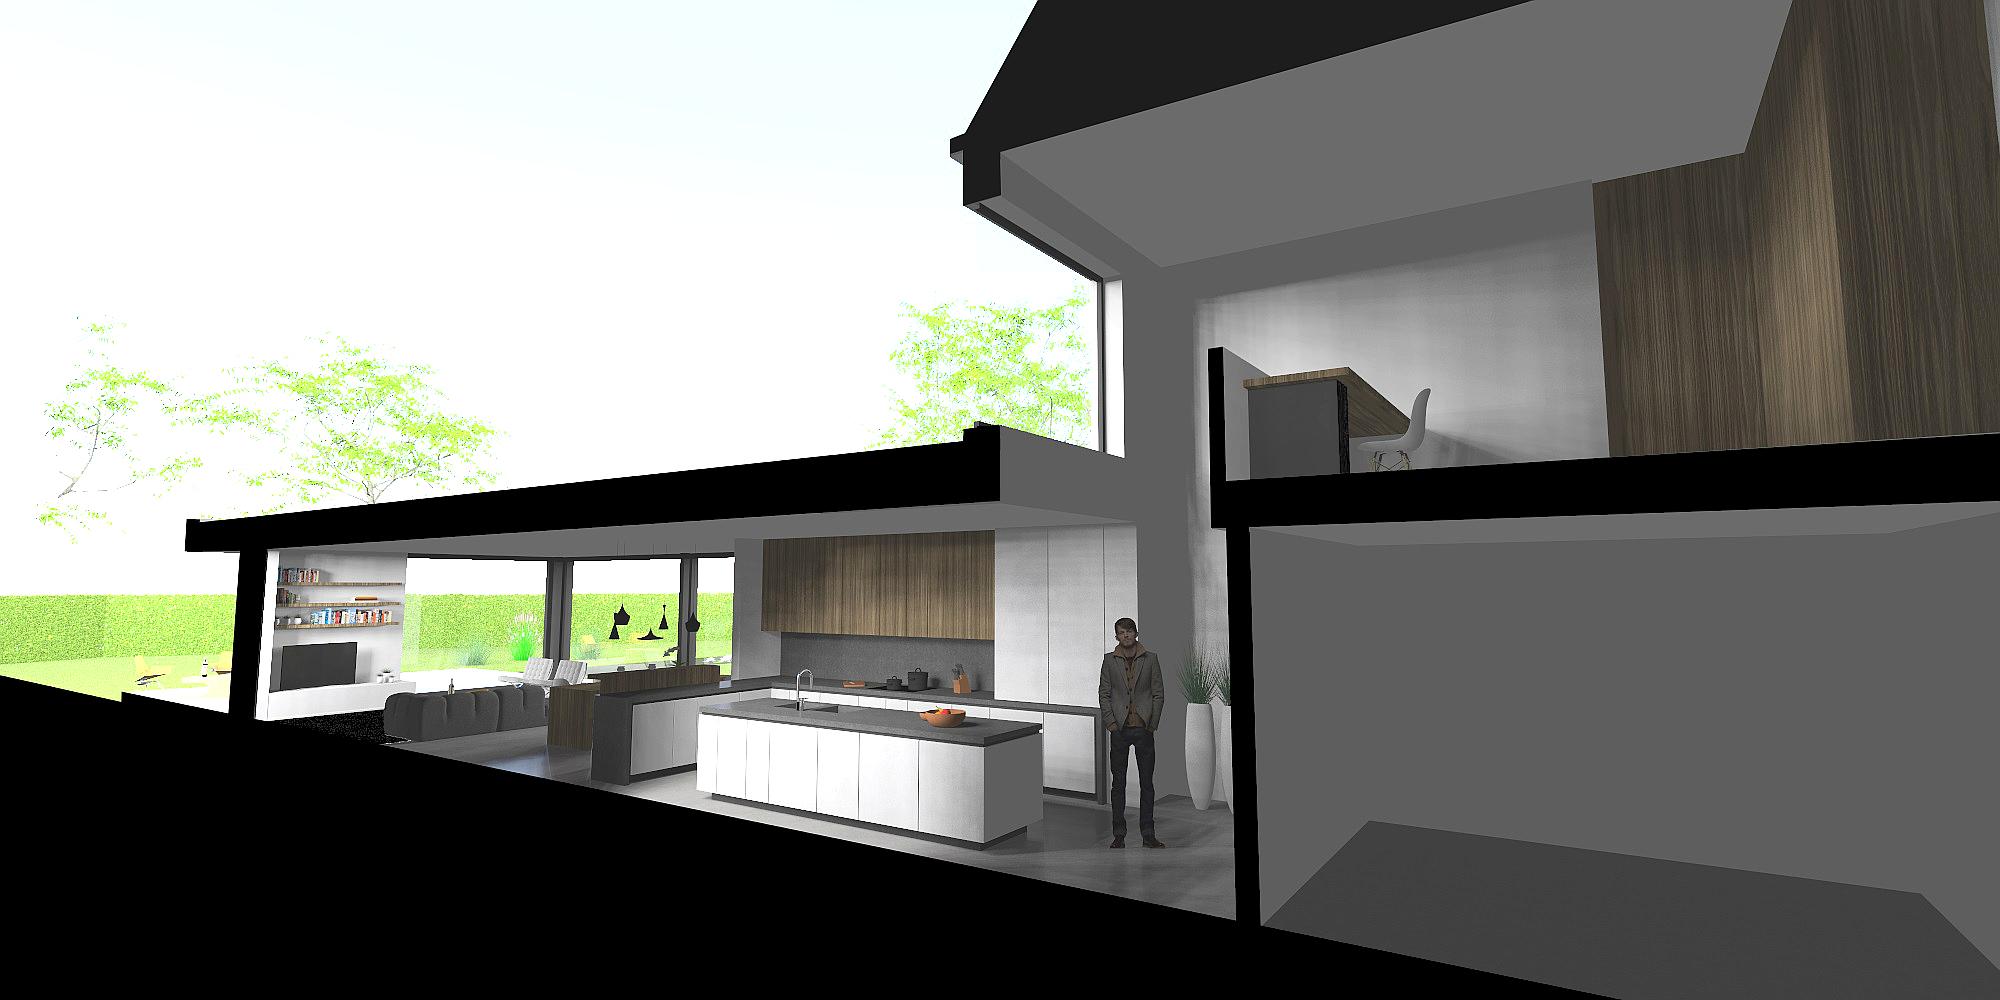 14_011_VM_VANWONTERGHEM OT 3D 02 interieur 12.jpg